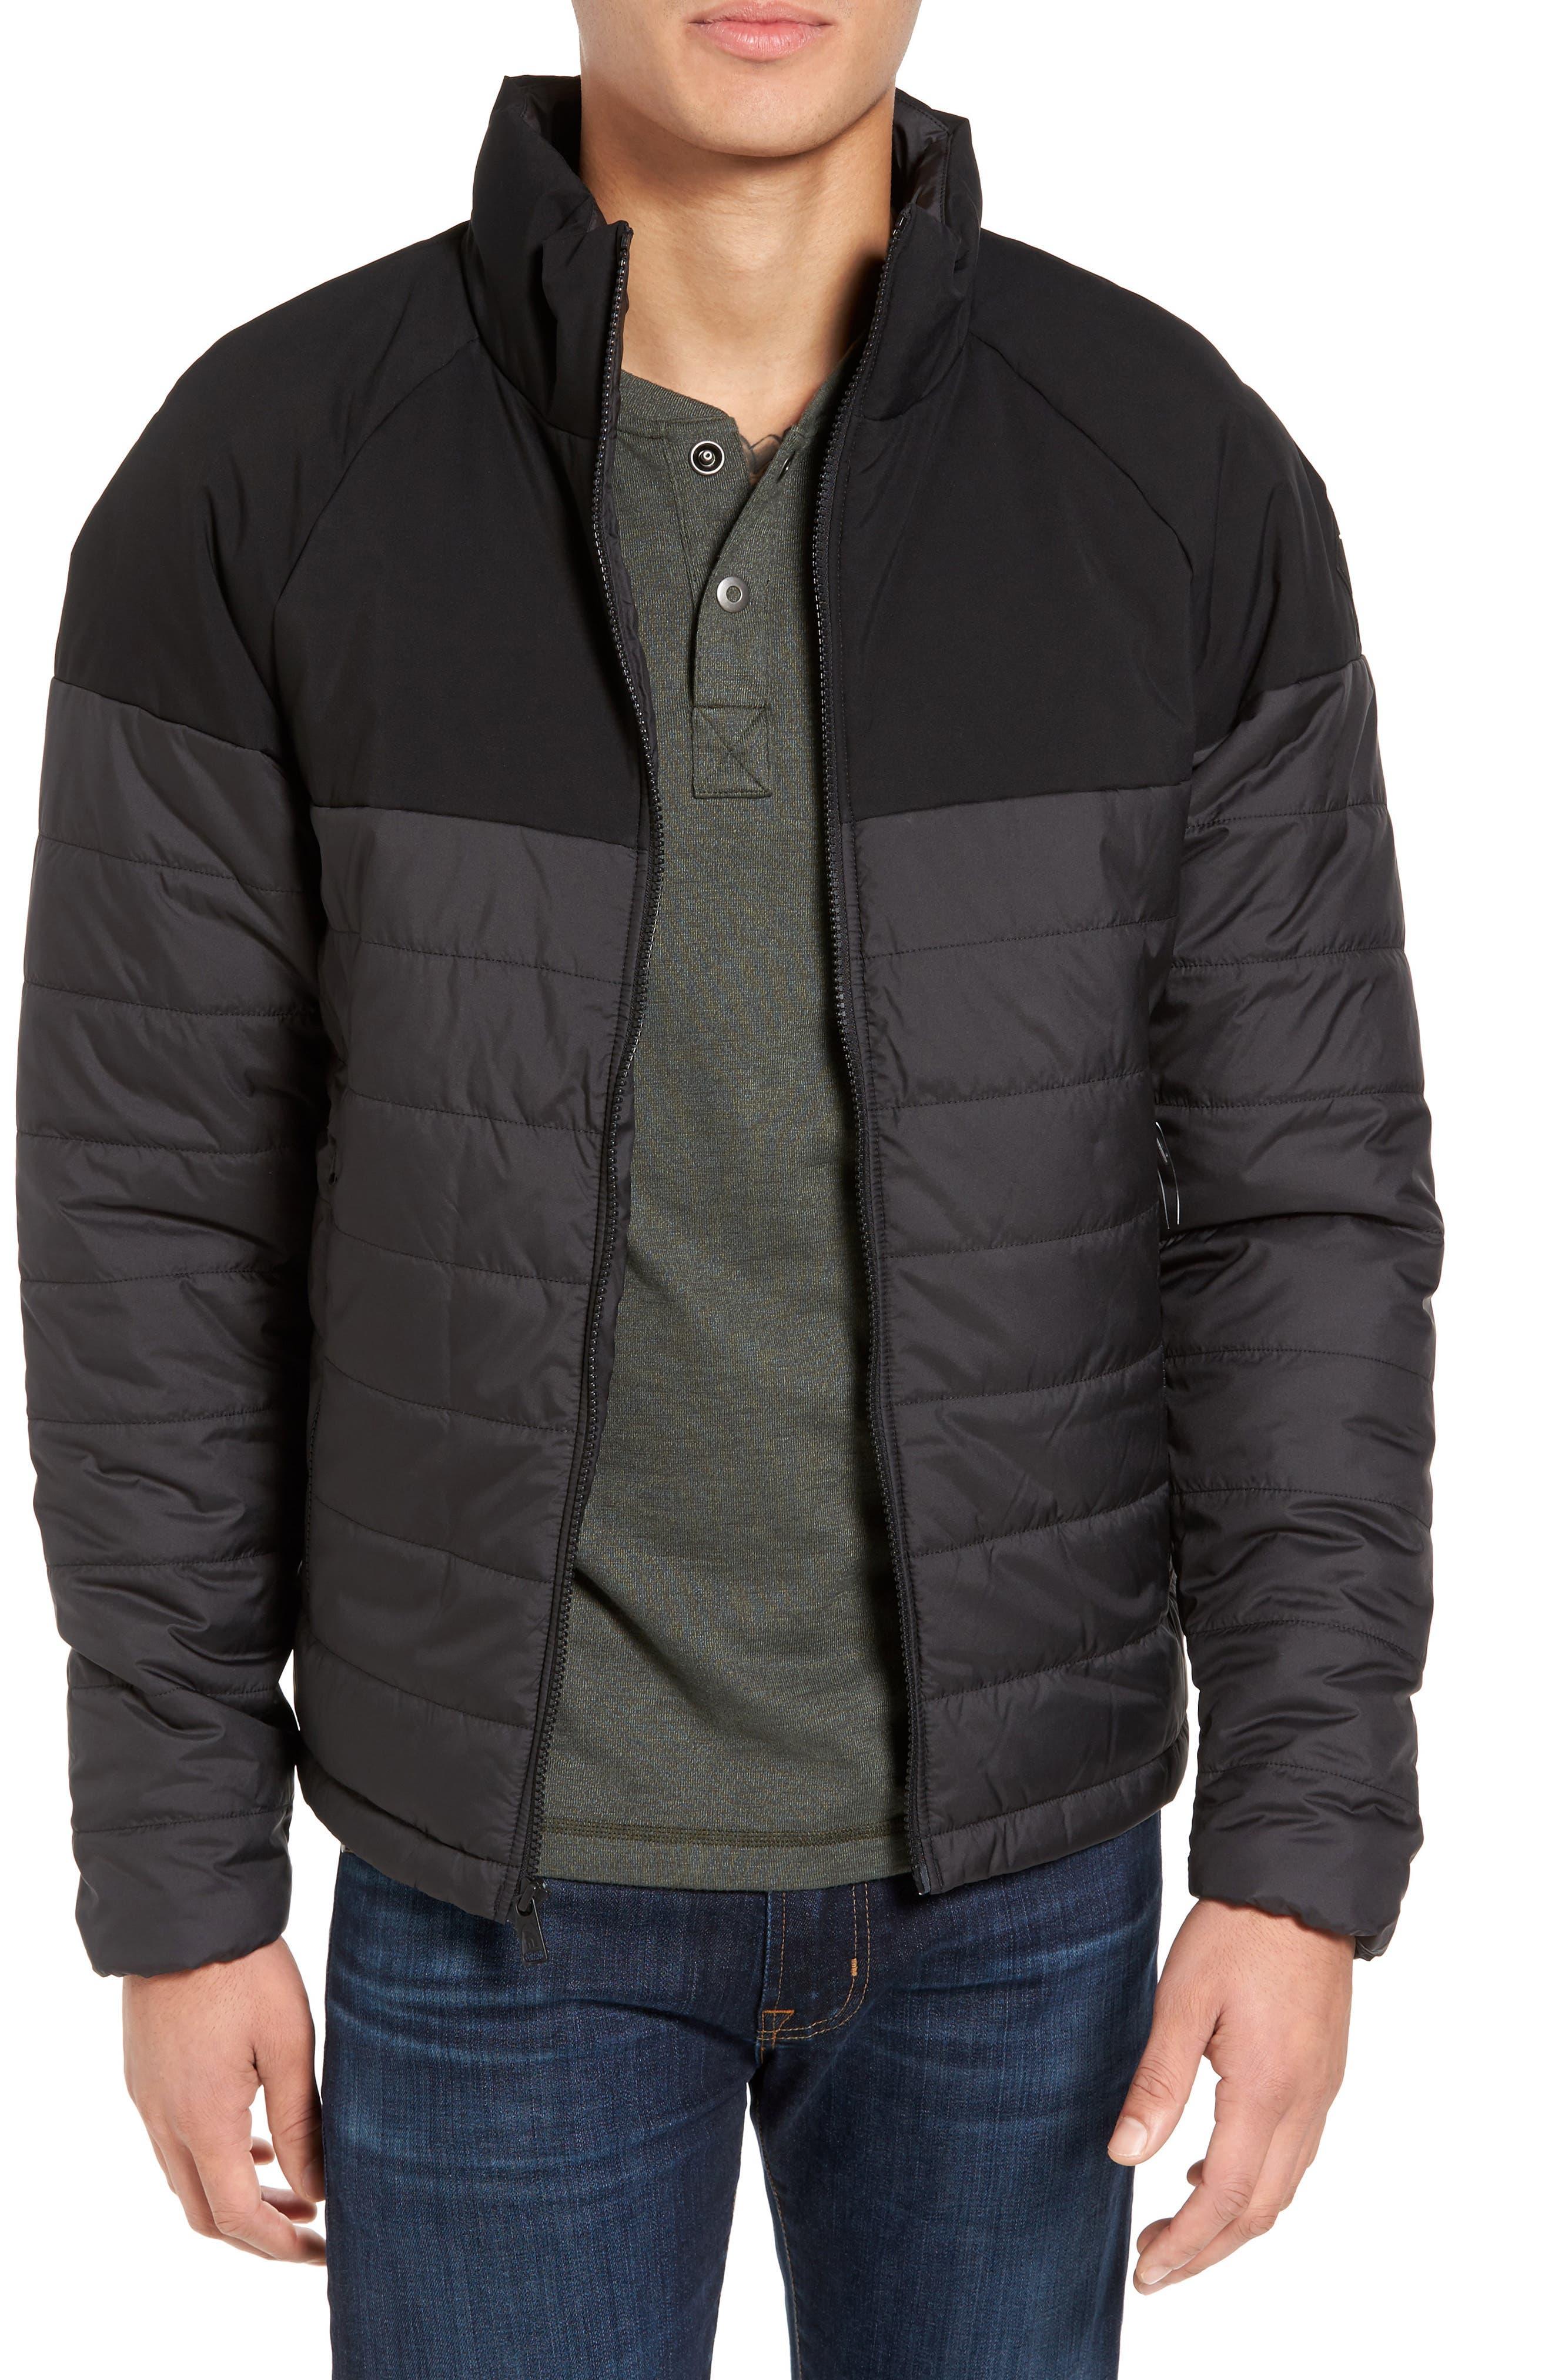 Alternate Image 1 Selected - The North Face Skokie Jacket